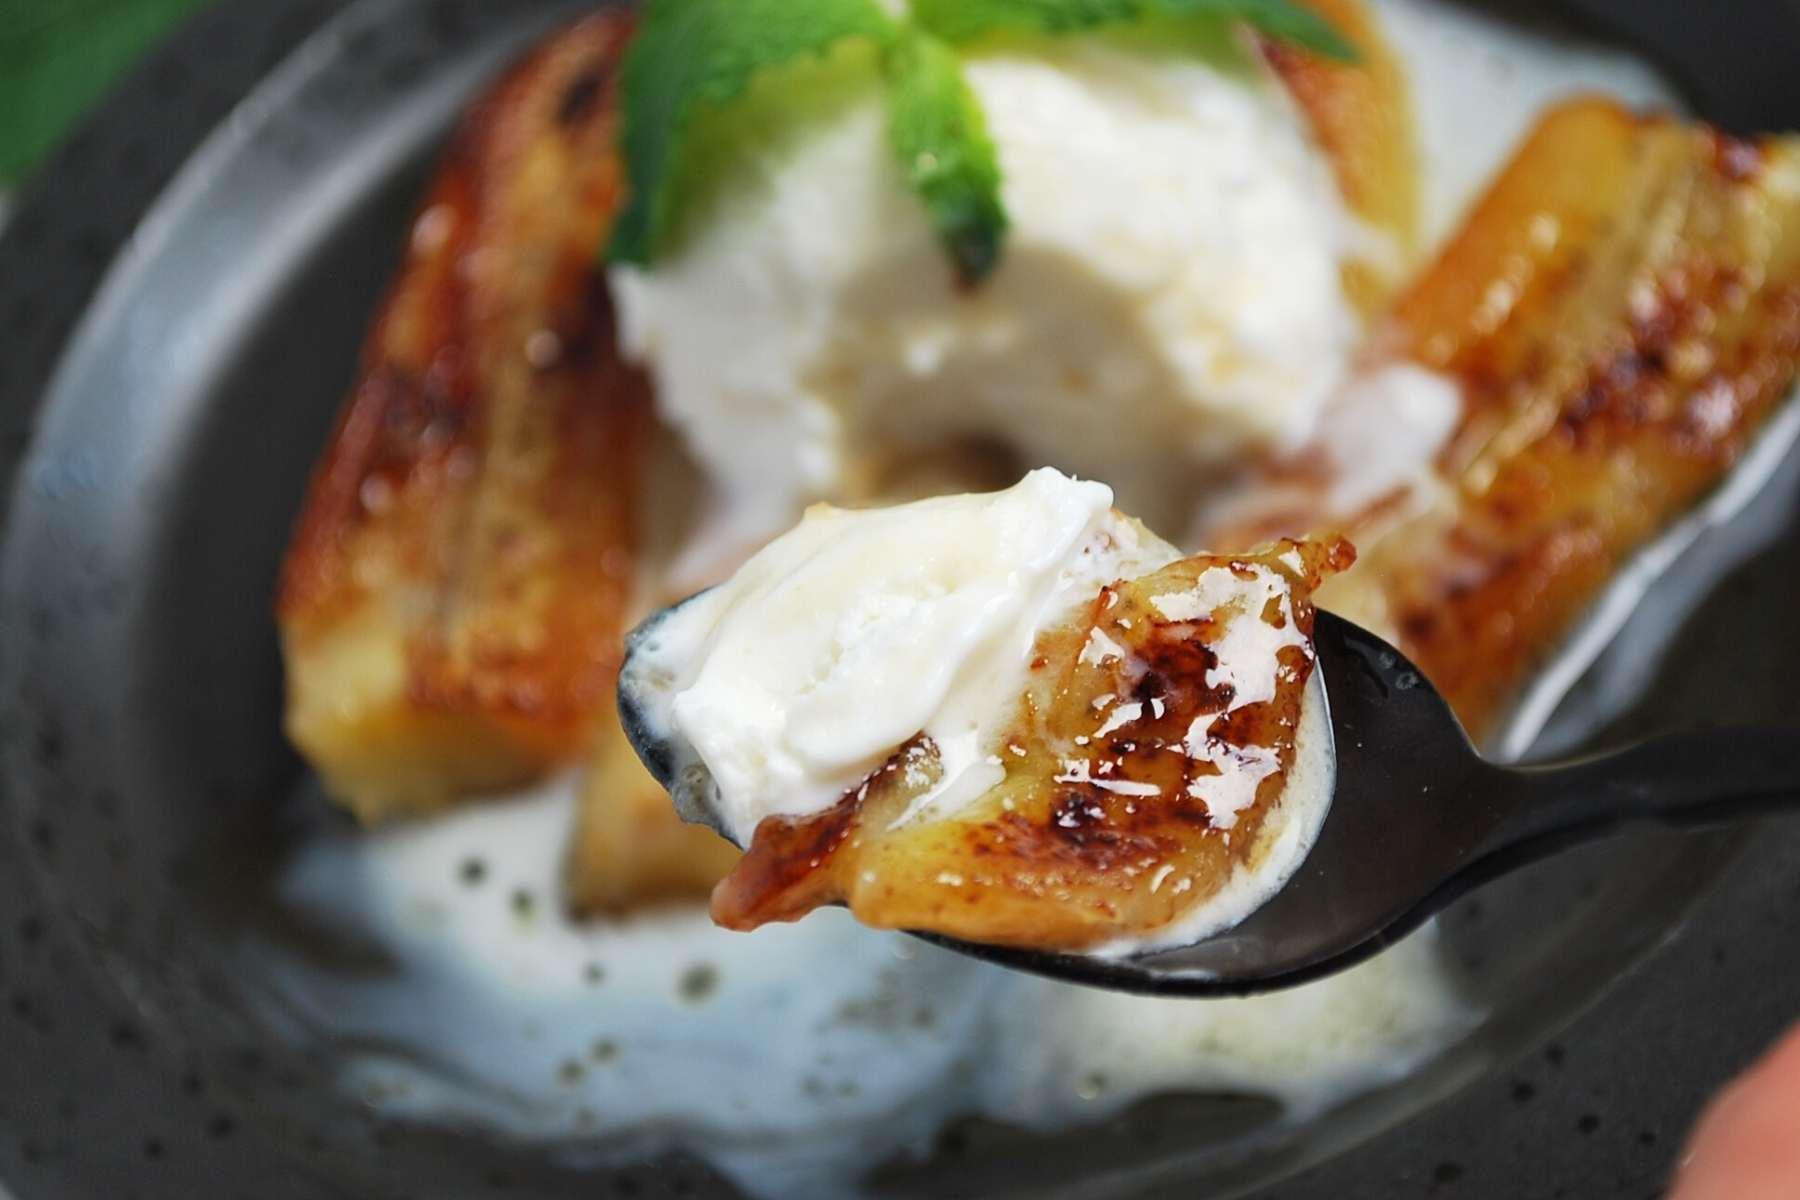 spoonful of caramelized bananas with frozen yogurt